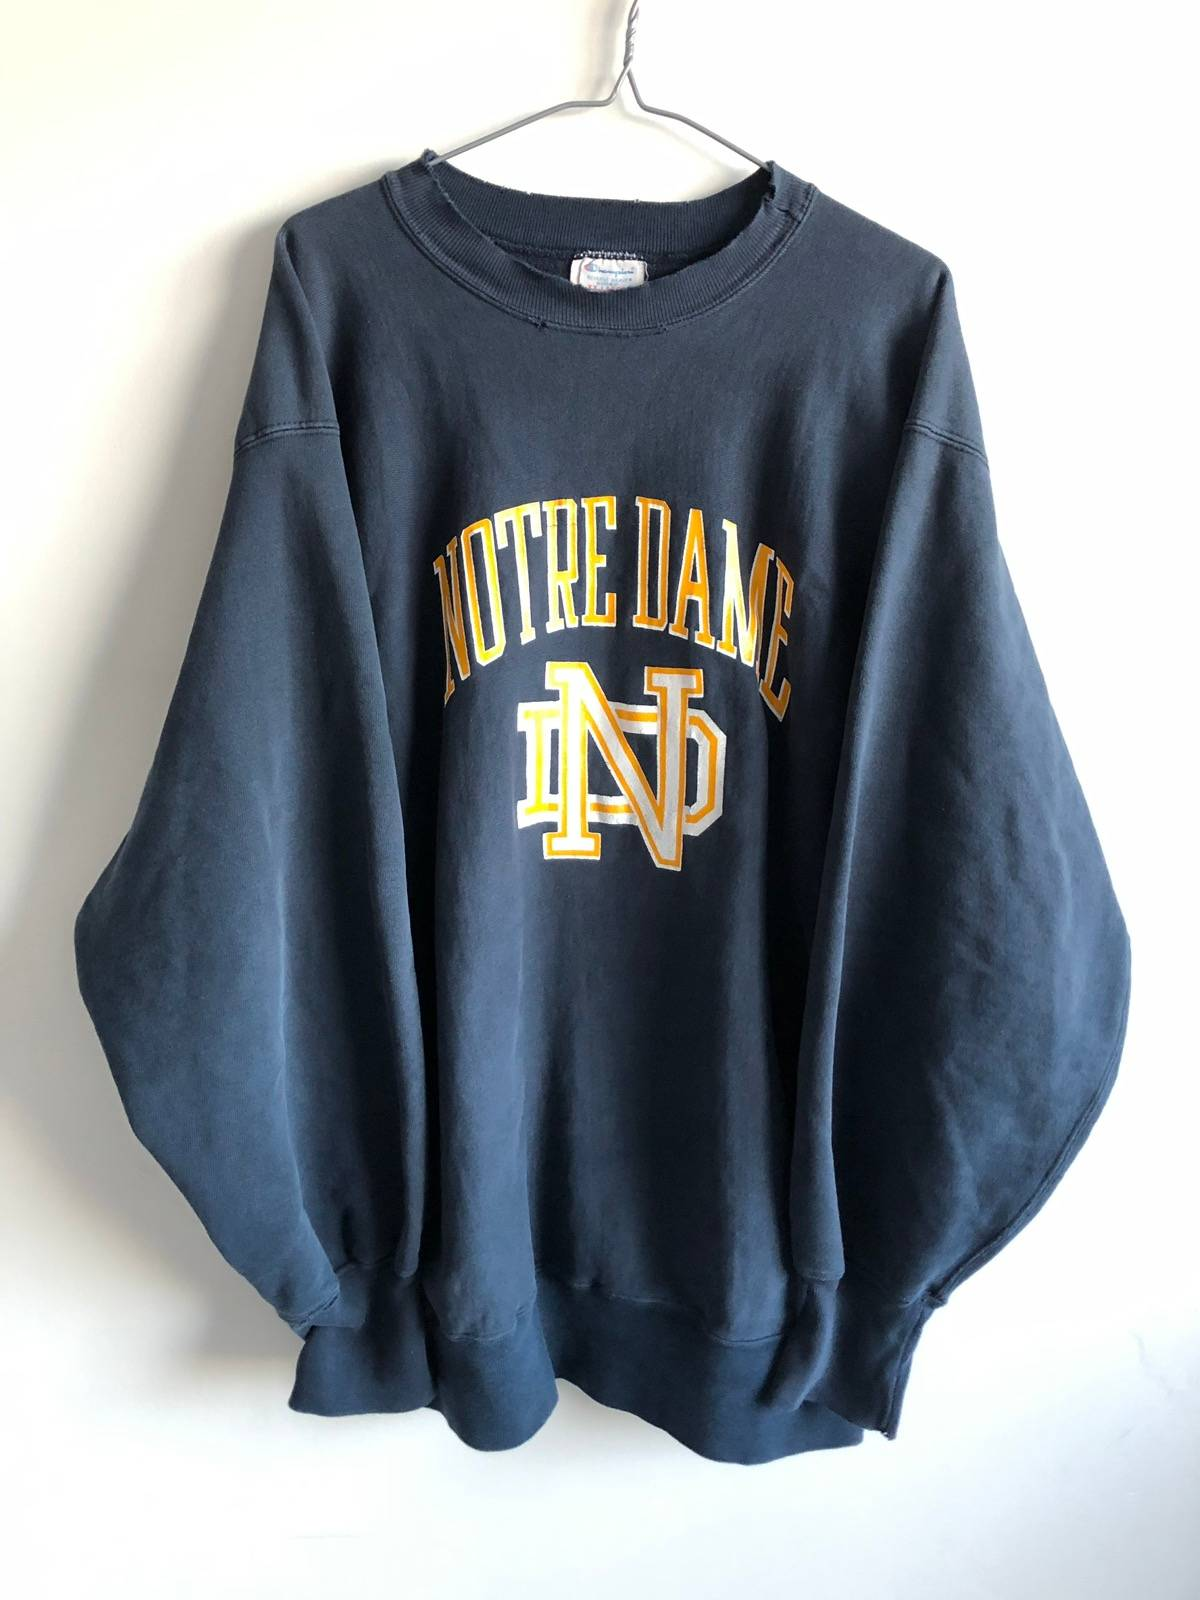 Champion Vintage Champion Notre Dame Crewneck 80's !Free Shipping! Size Xl  $31